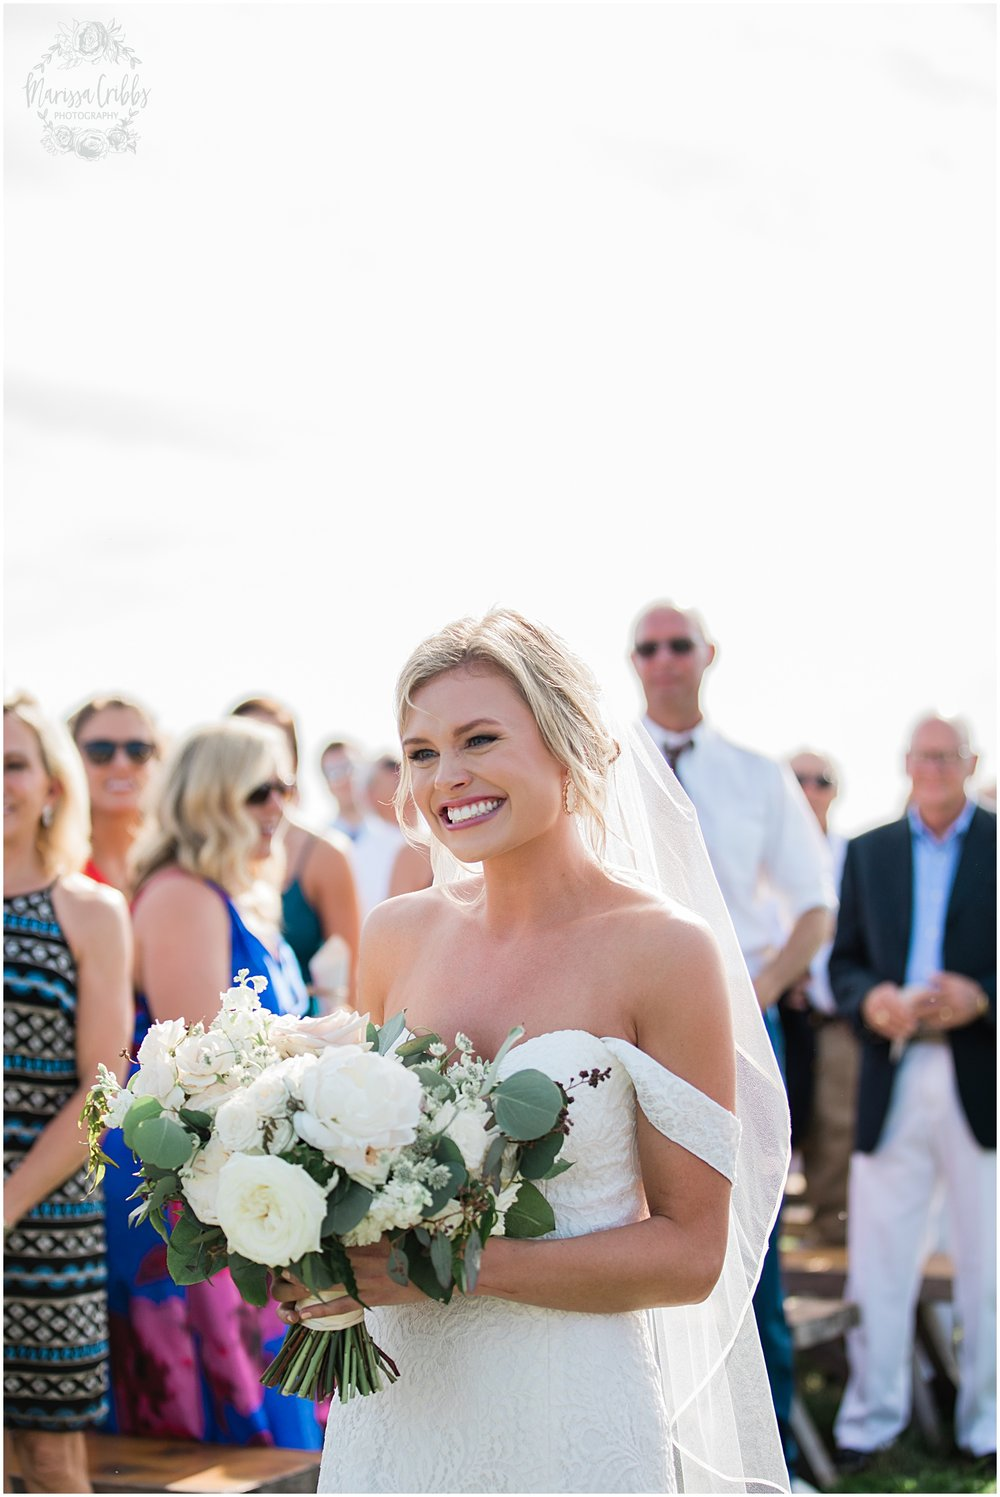 RHODES WEDDING | WESTON RED BARN FARM | MARISSA CRIBBS PHOTOGRAPHY_5271.jpg